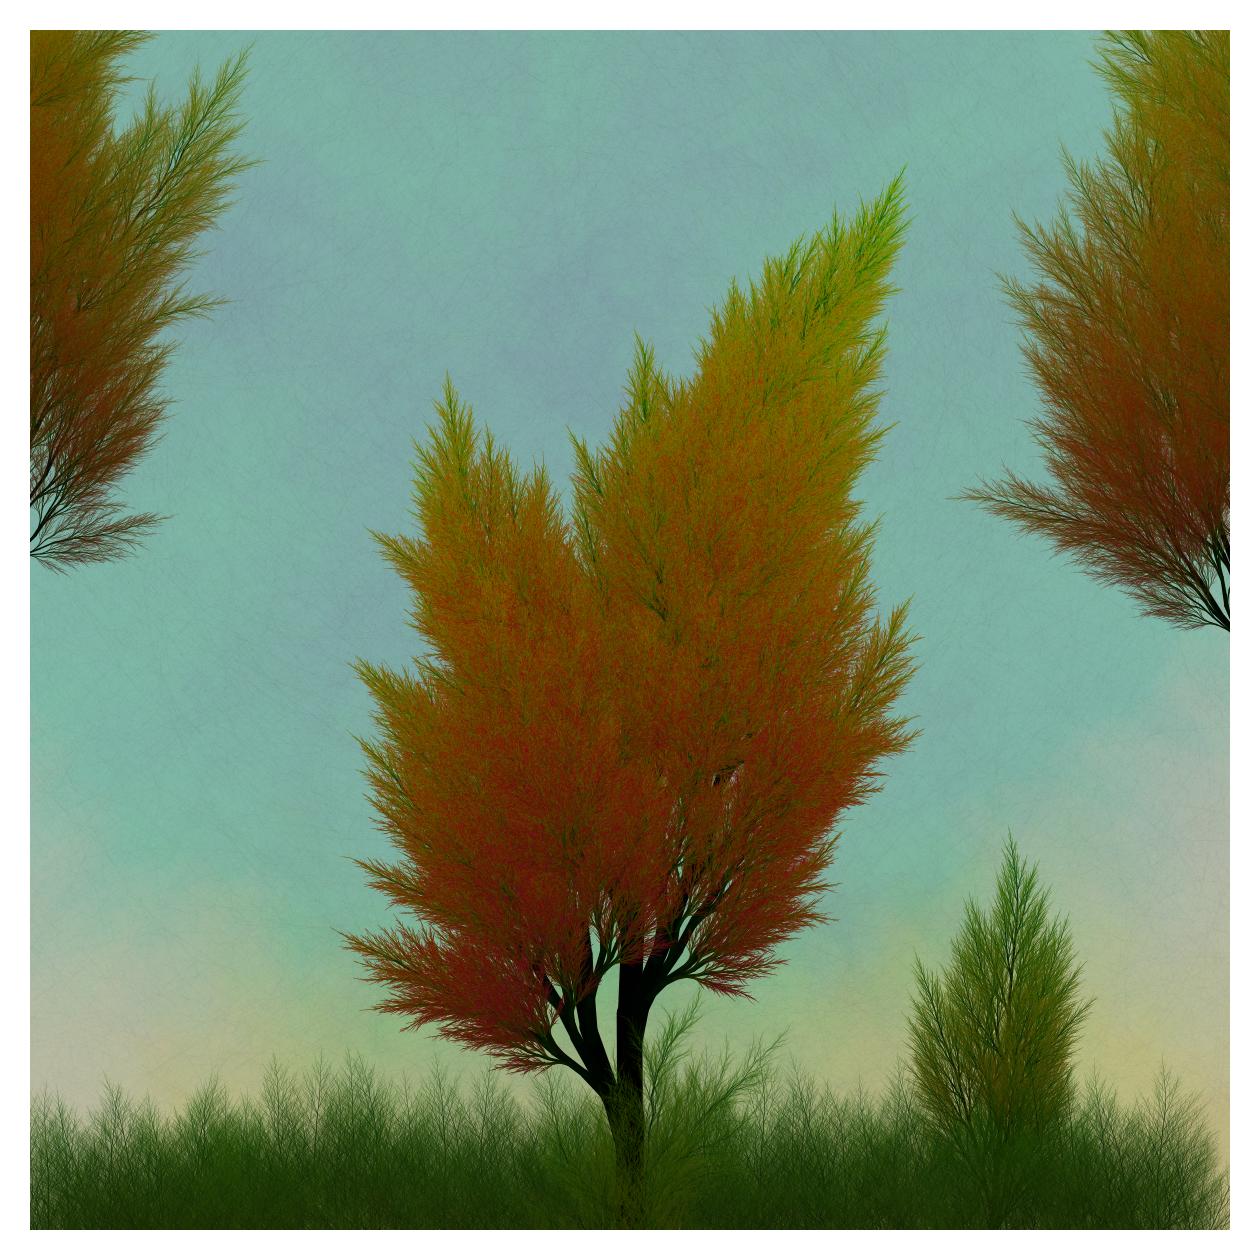 Generative Autumn Tree - variation FVP by netgenetics